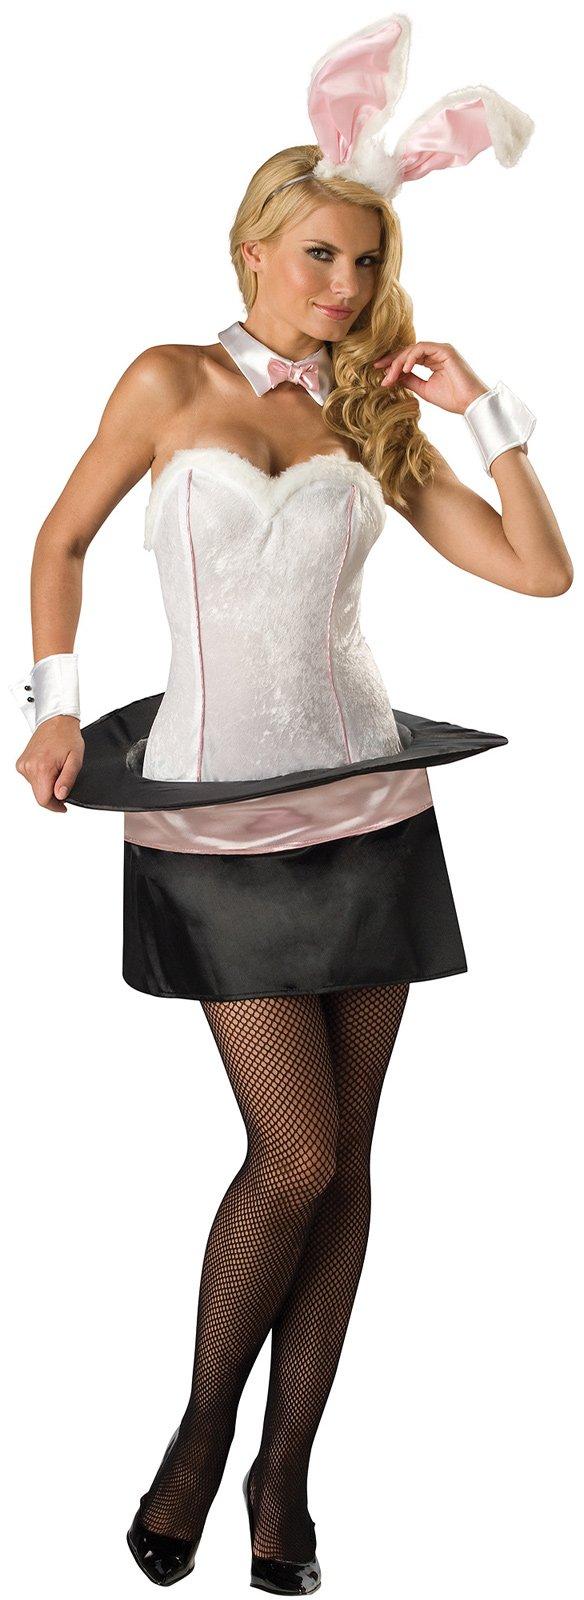 Sexy Magician Assistant - Hot Girls Wallpaper